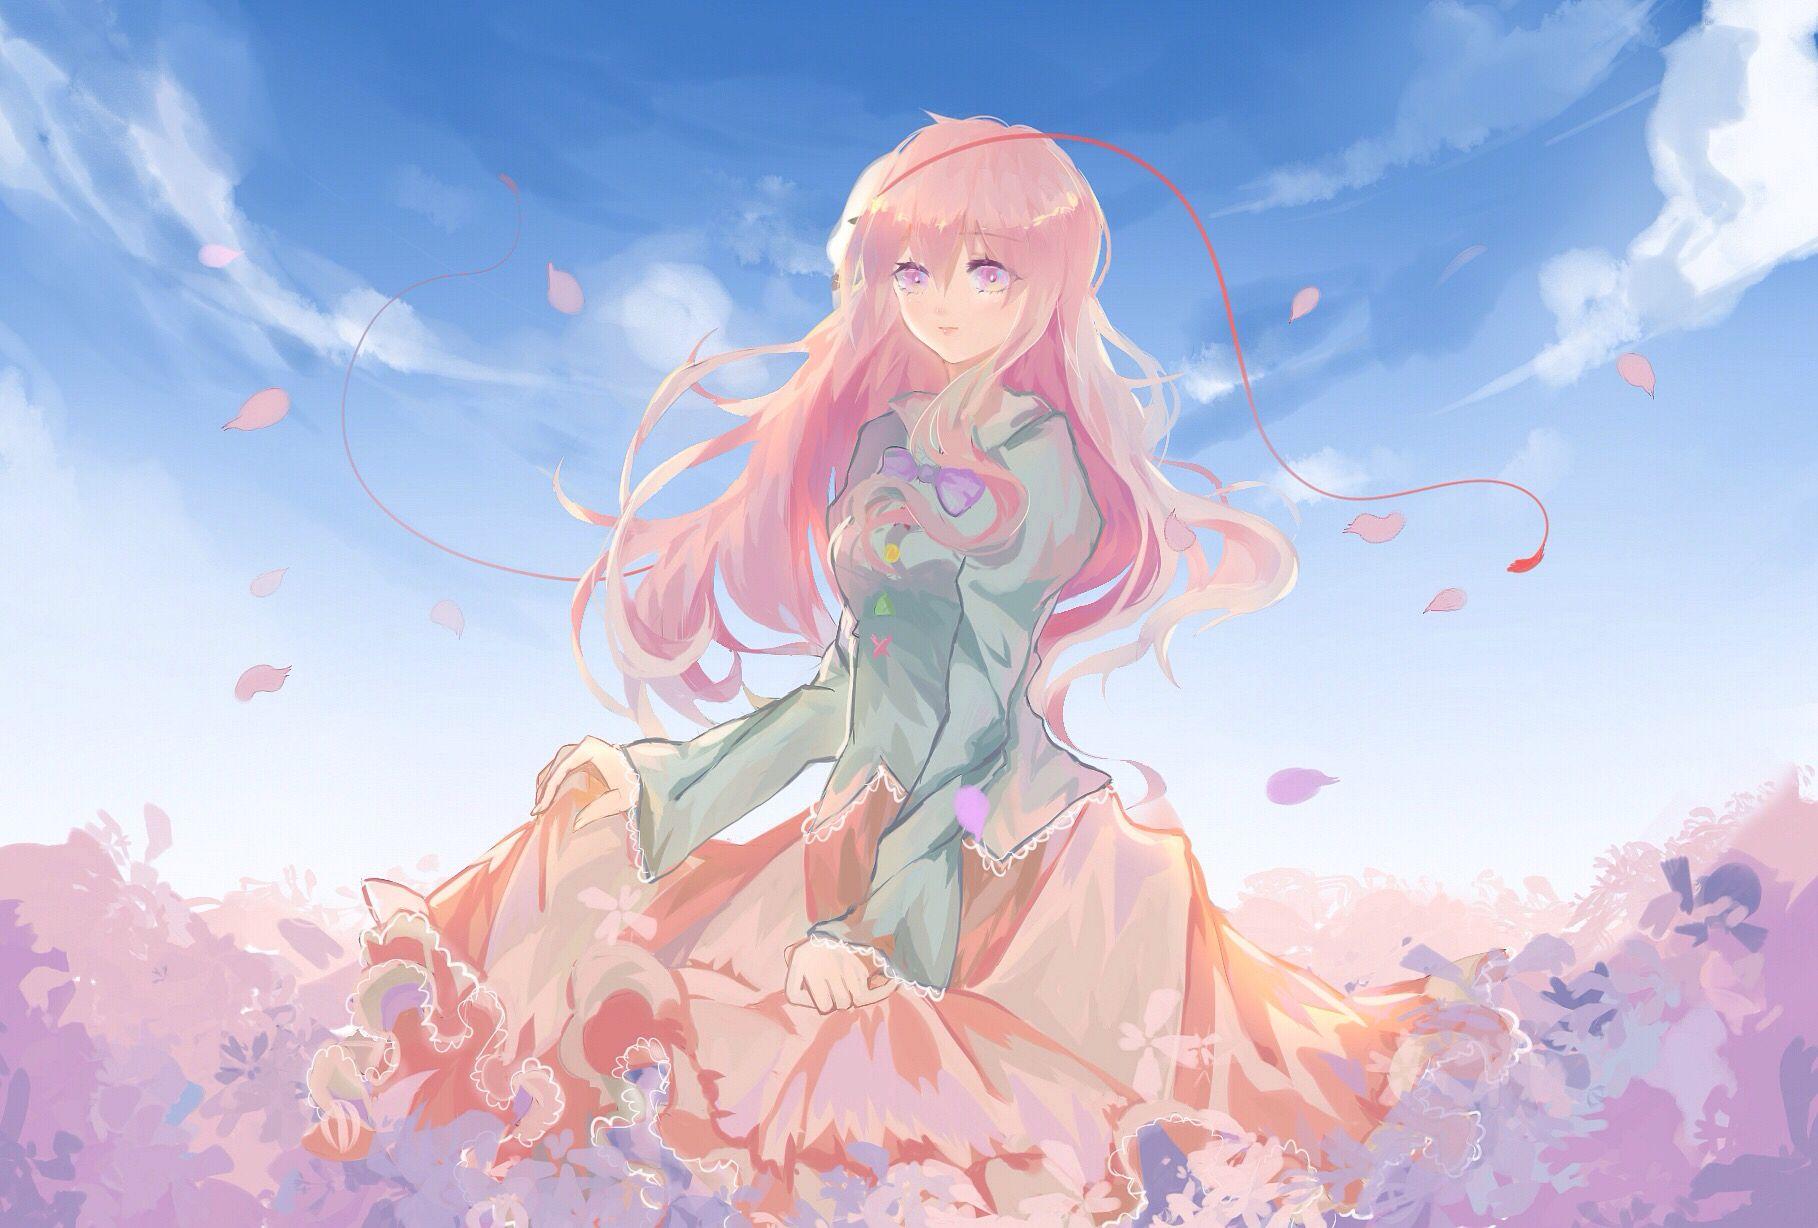 Anime girl pink hair cabelo rosa garotas anime desenhos lindos fundos garota